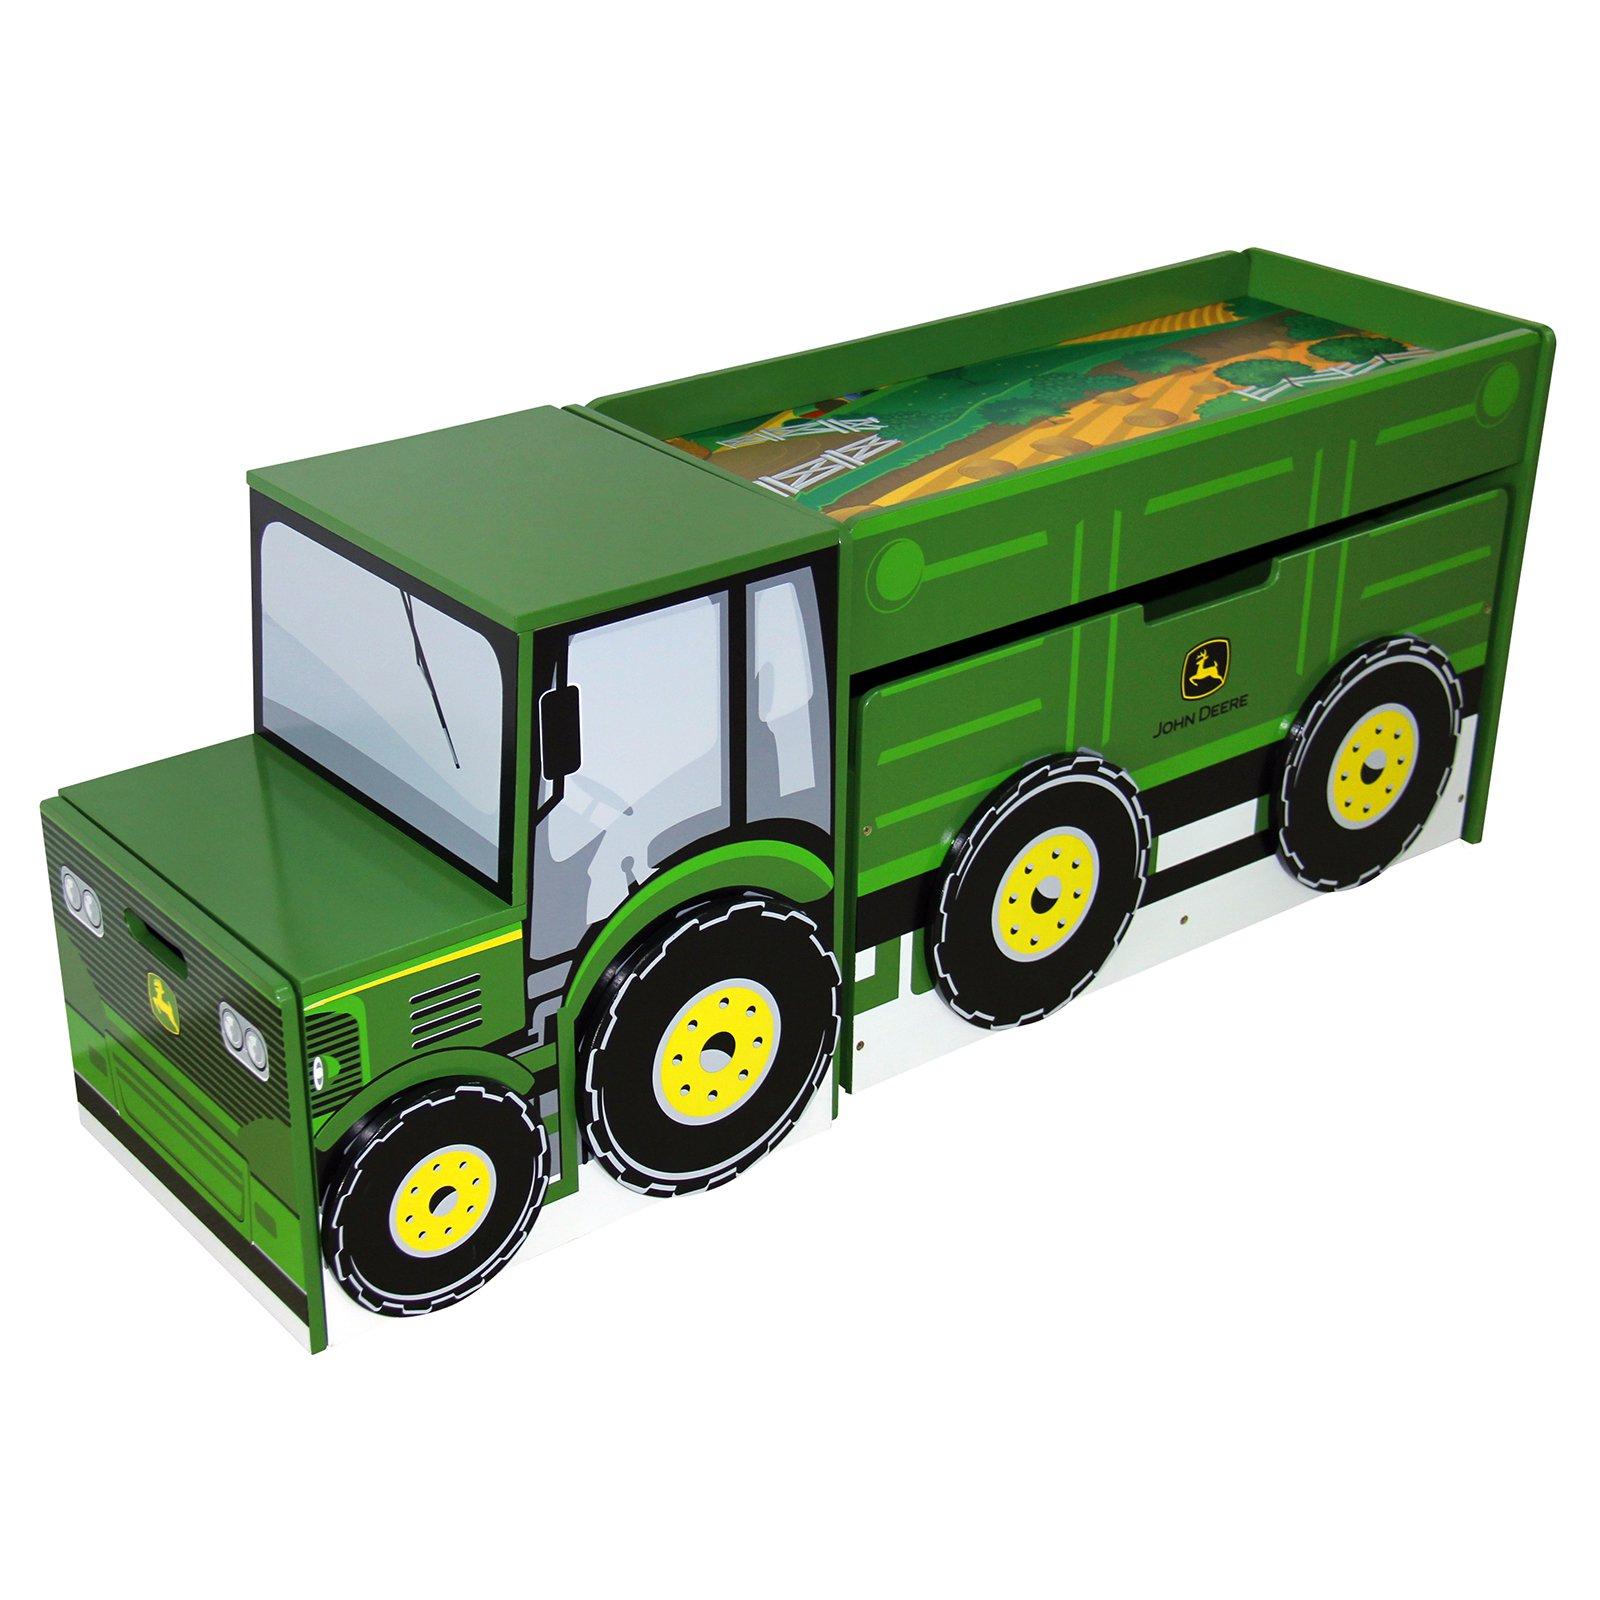 John Deere Tractor Toy Box Set